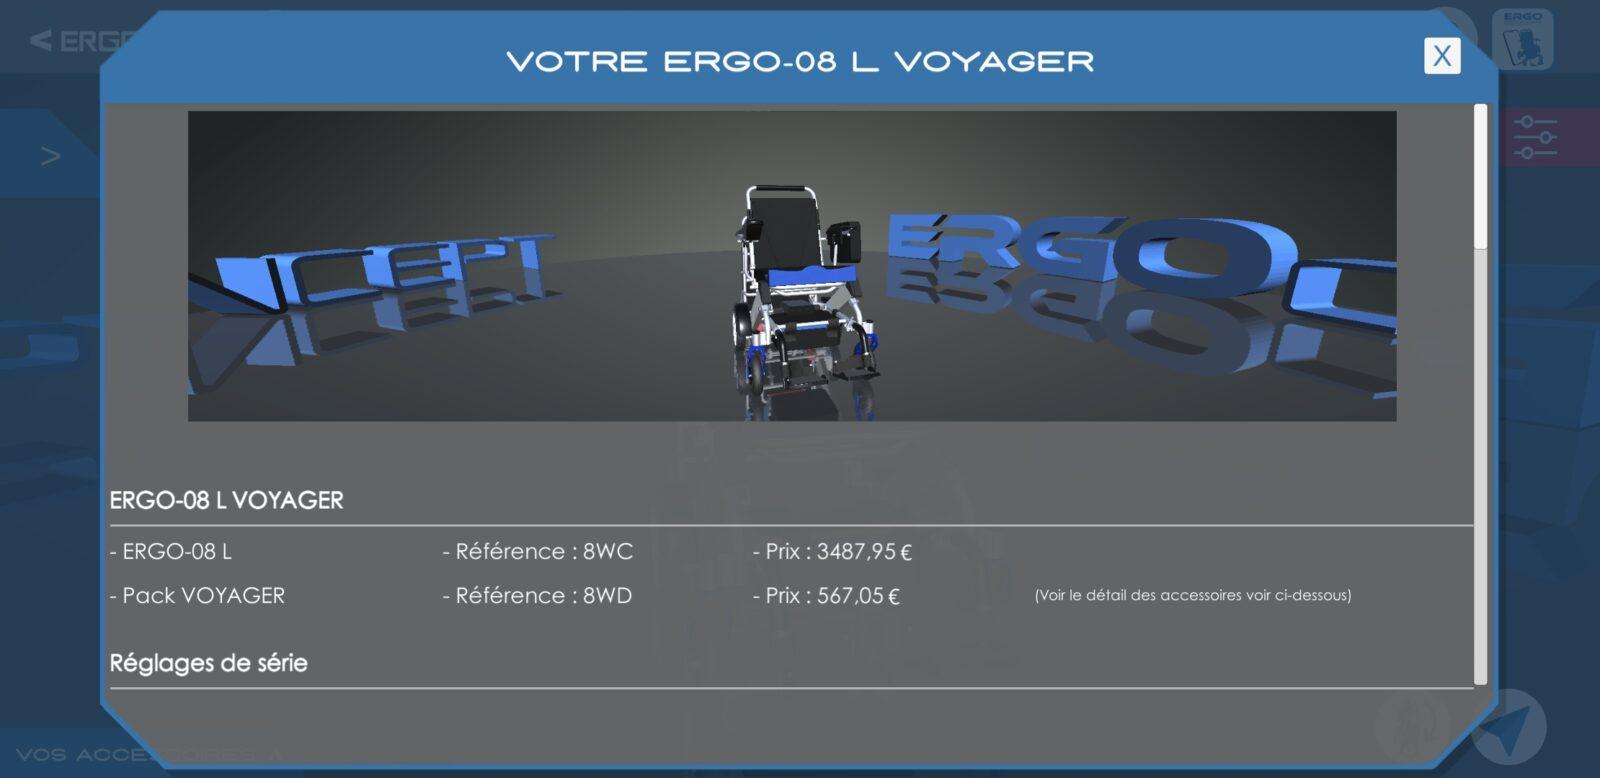 Configurateur ErgoConcept-envoyer la demande